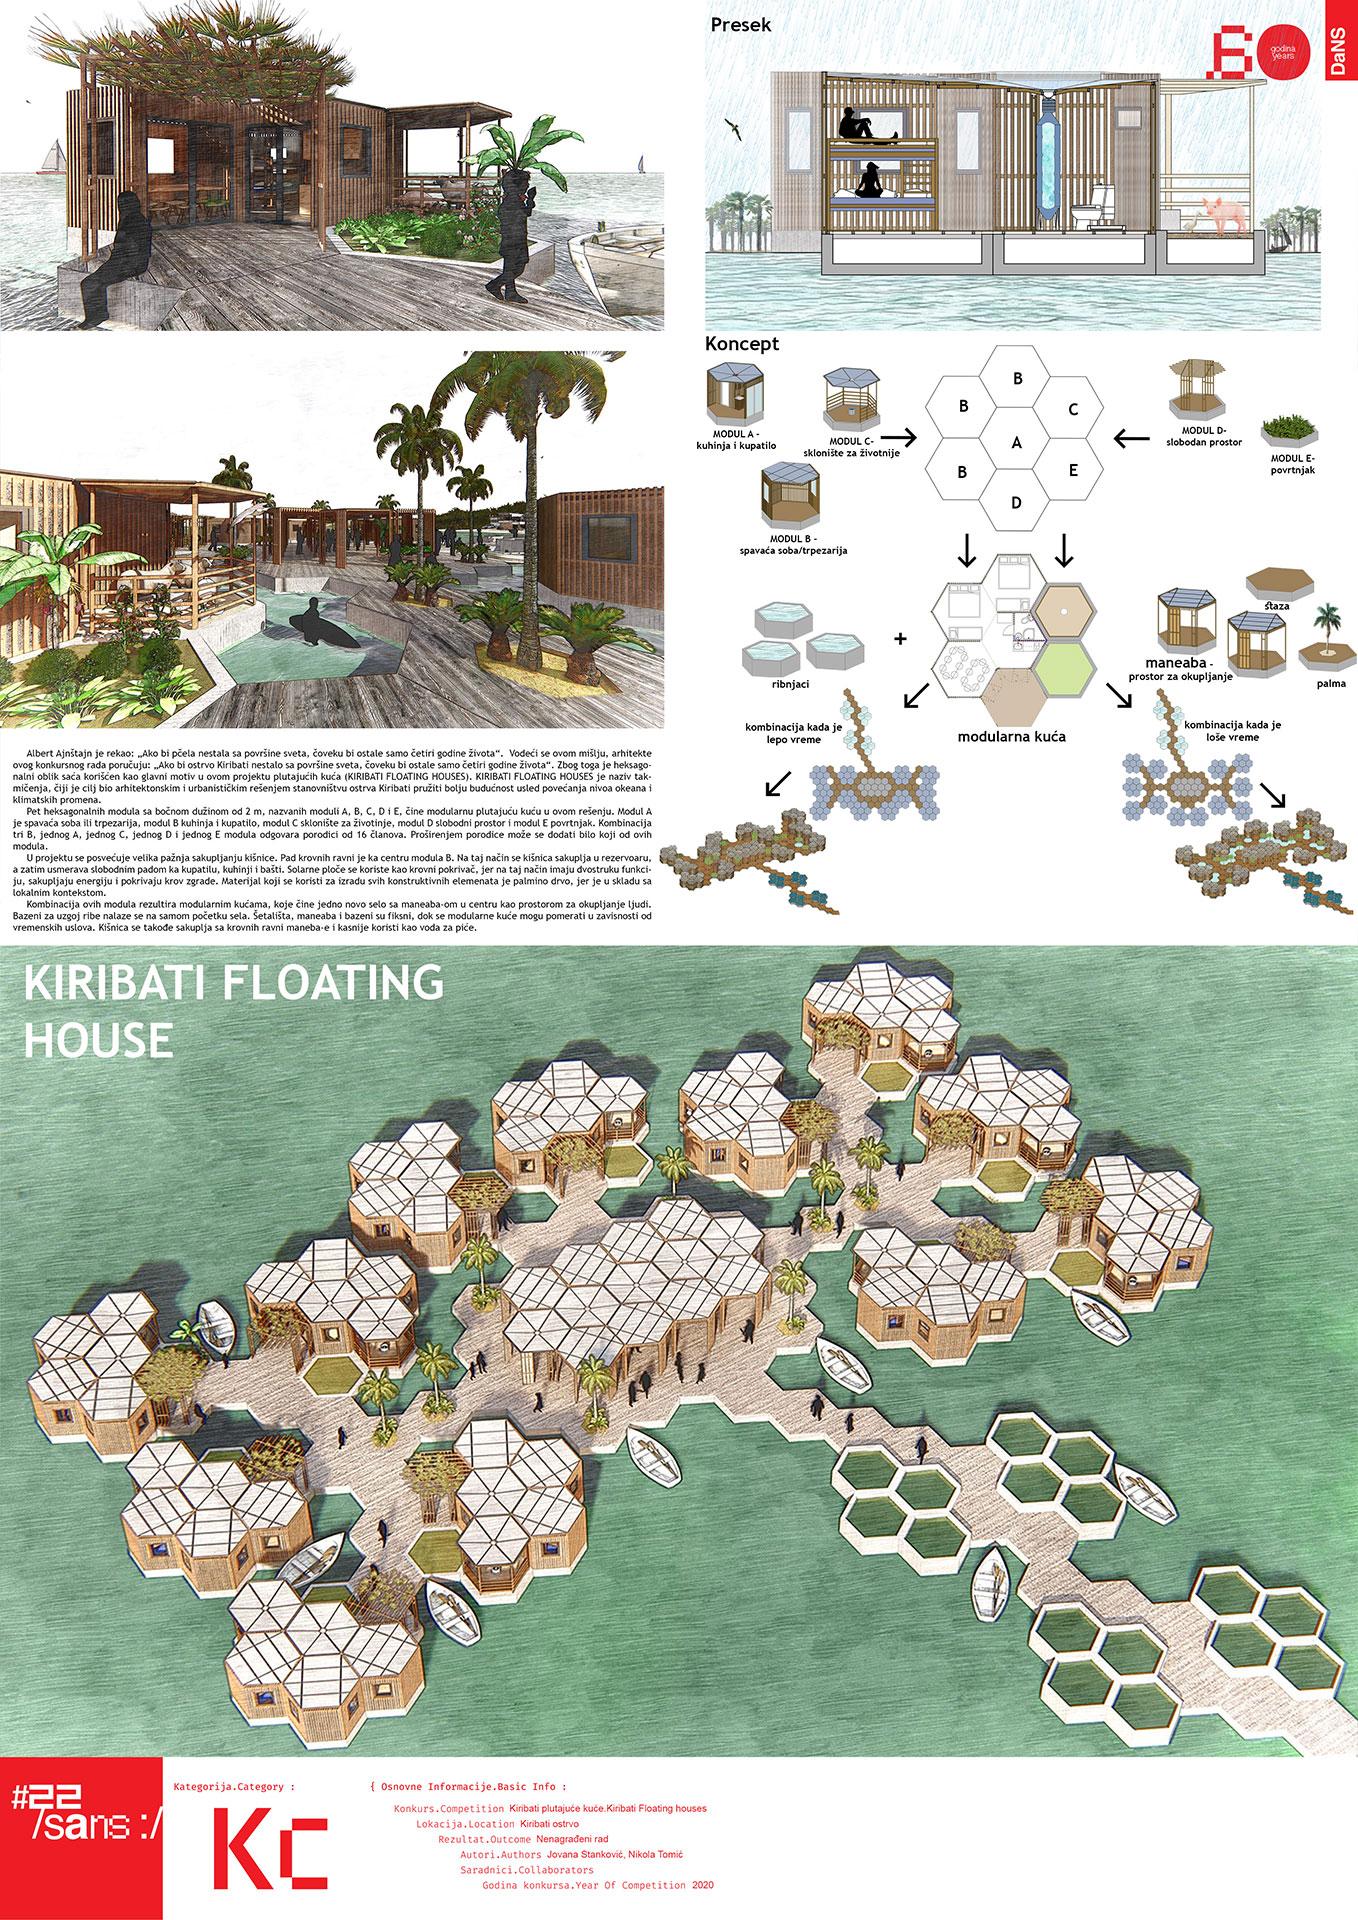 "<p class=""naslov-br"">kc13</p>Plutajuće kuće u Kiribatiju // Kiribati Floating houses"